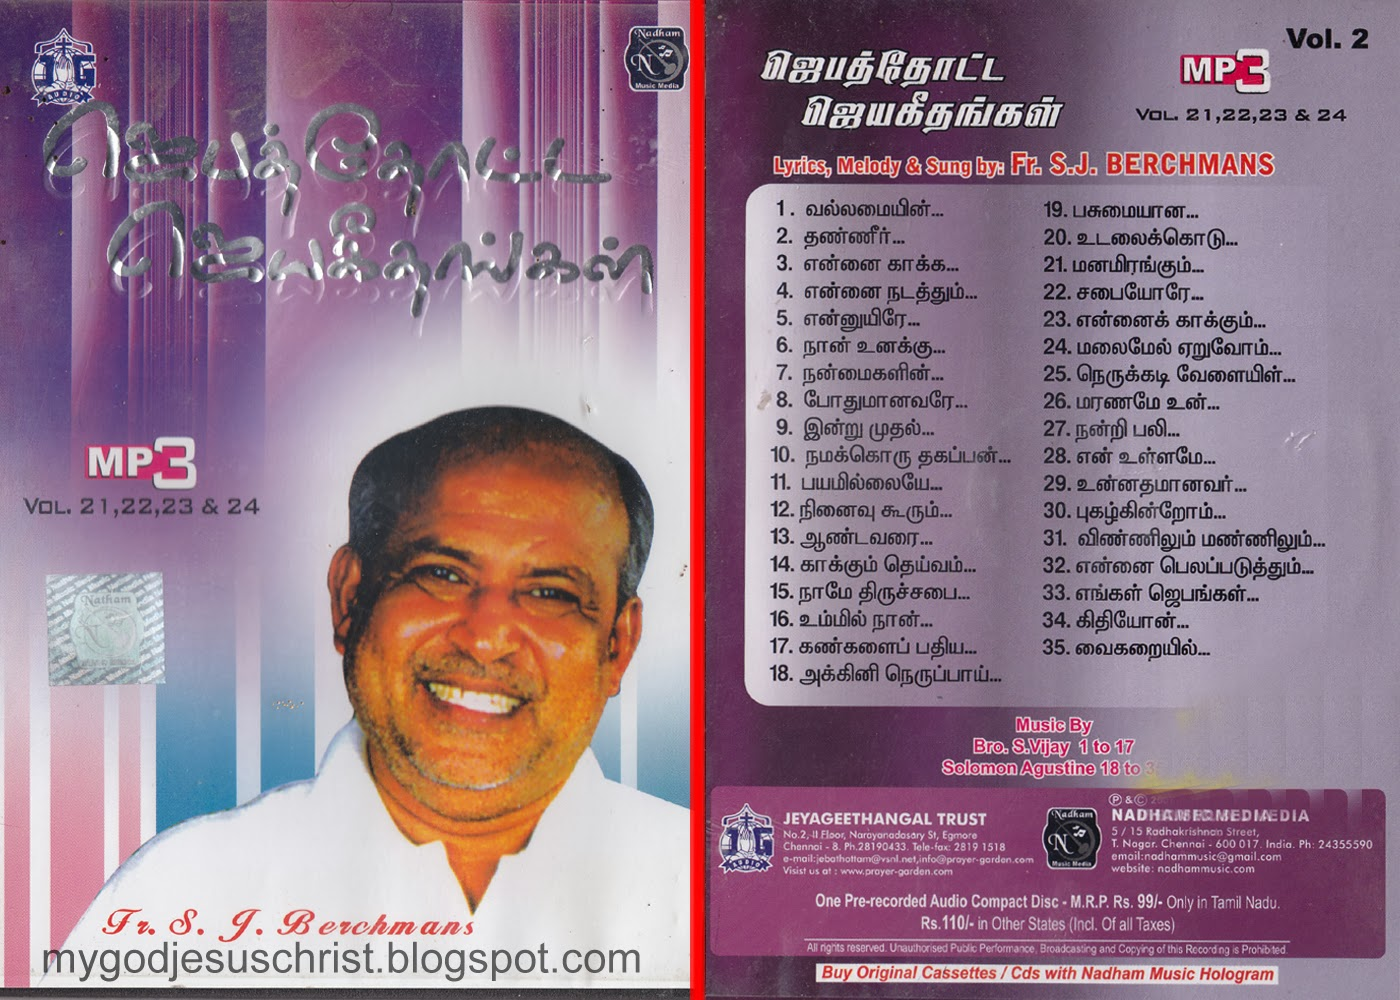 Worship Gospel Music Jabathotta Jayageethangal Vol 21 24 Tamil Songs Download